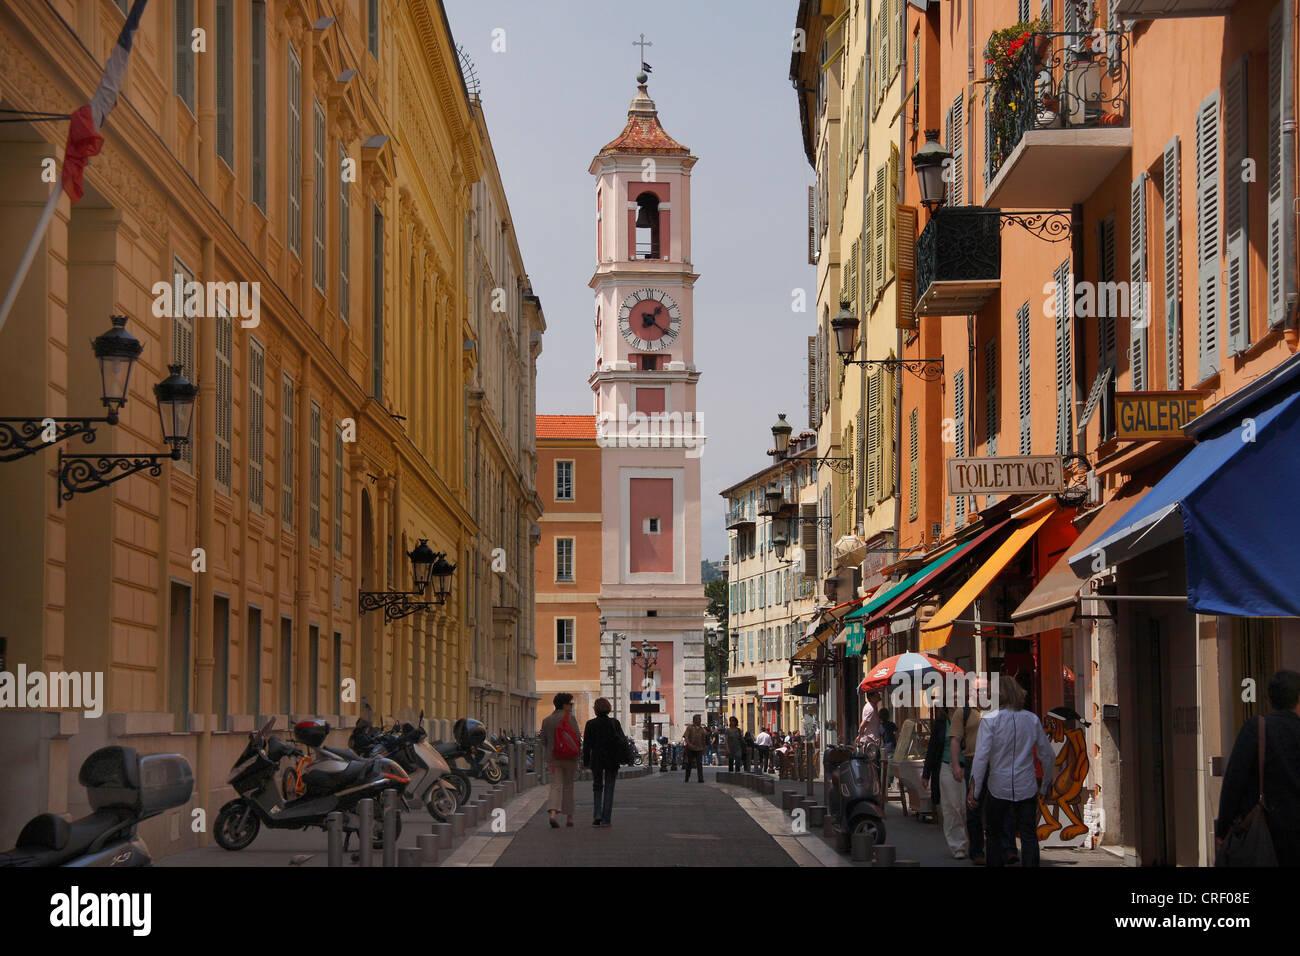 old city of Nizza, France - Stock Image